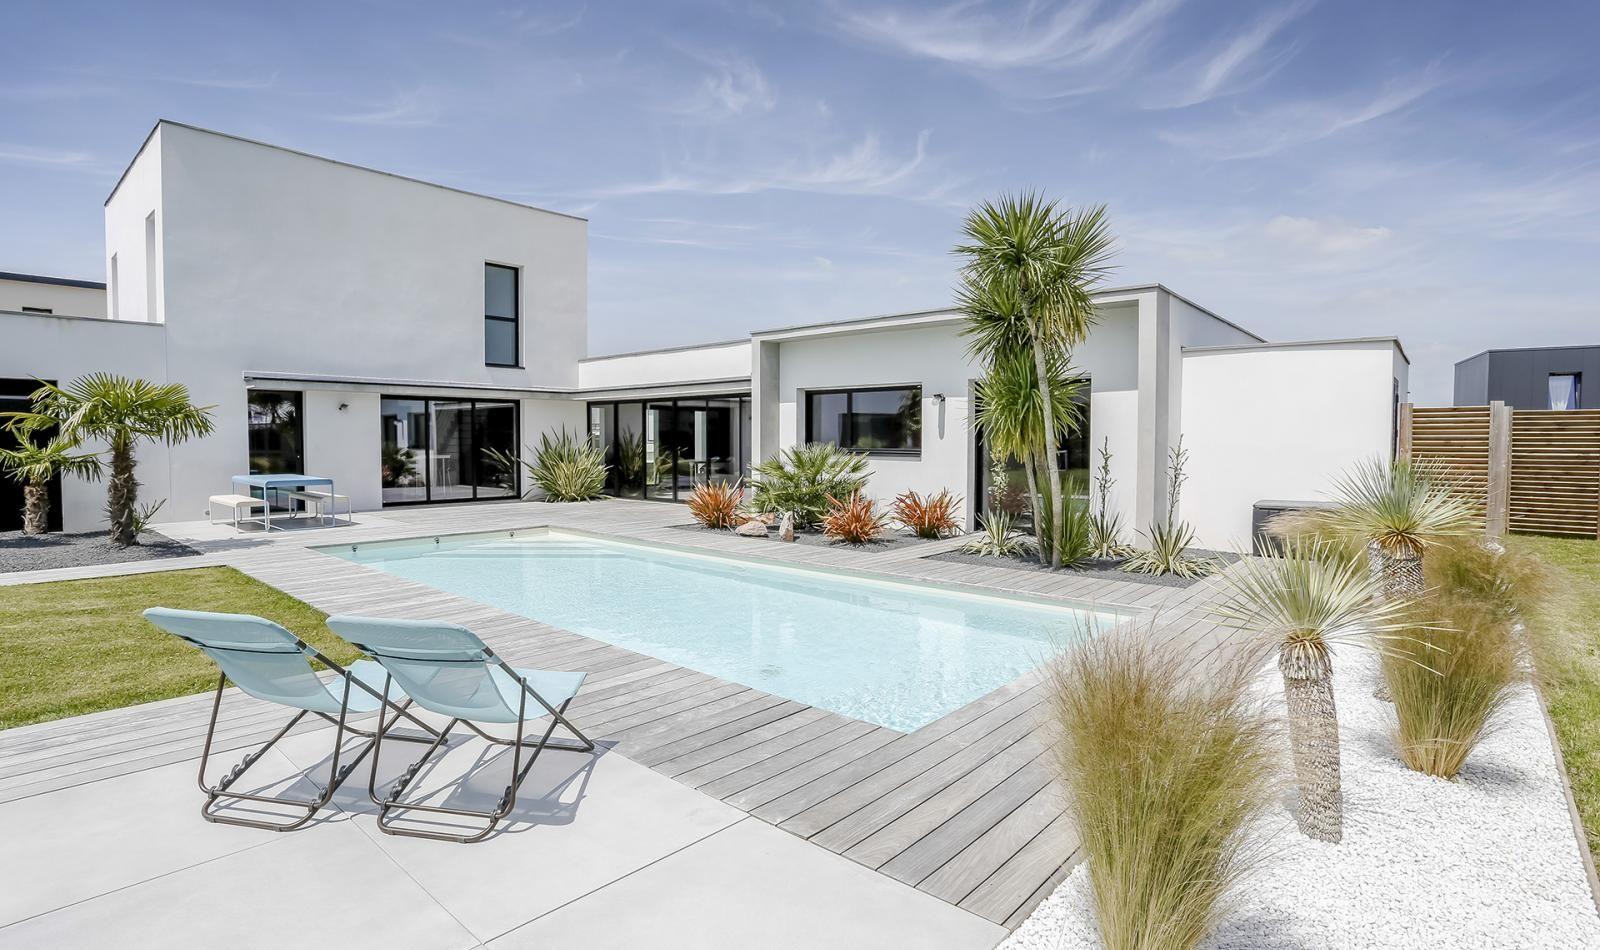 piscine classique 3 5x9m liner sable smartcover piscine en 2018 pinterest piscine. Black Bedroom Furniture Sets. Home Design Ideas